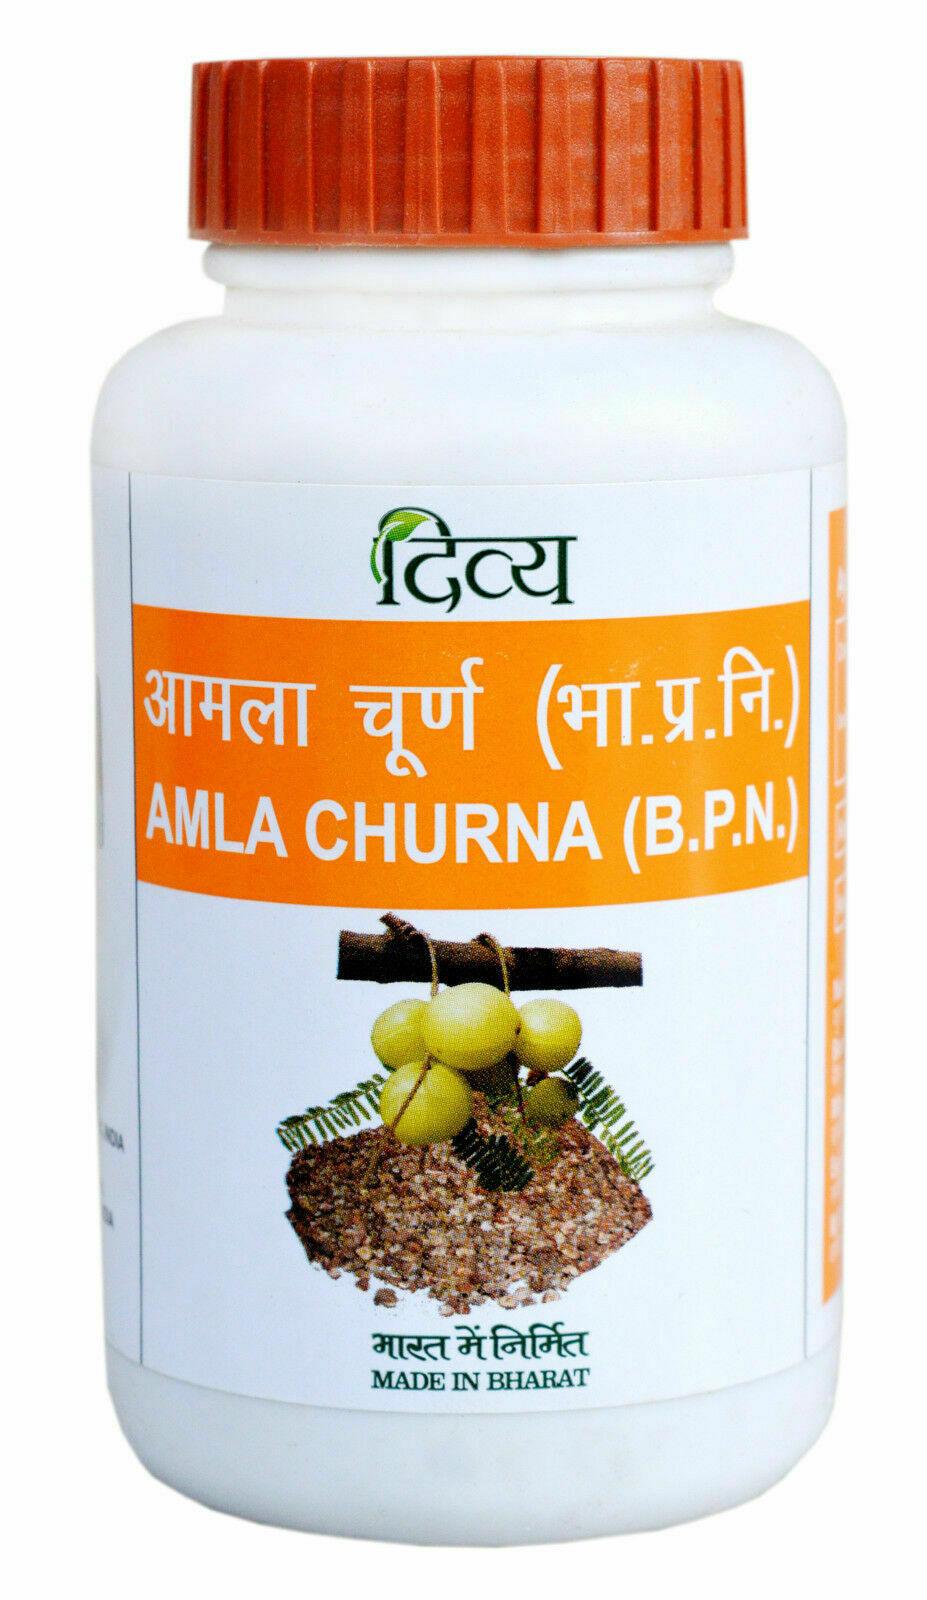 2 X Patanjali Amla Churna Powder For Skin/ Hair/ Digestion Each 100gm.